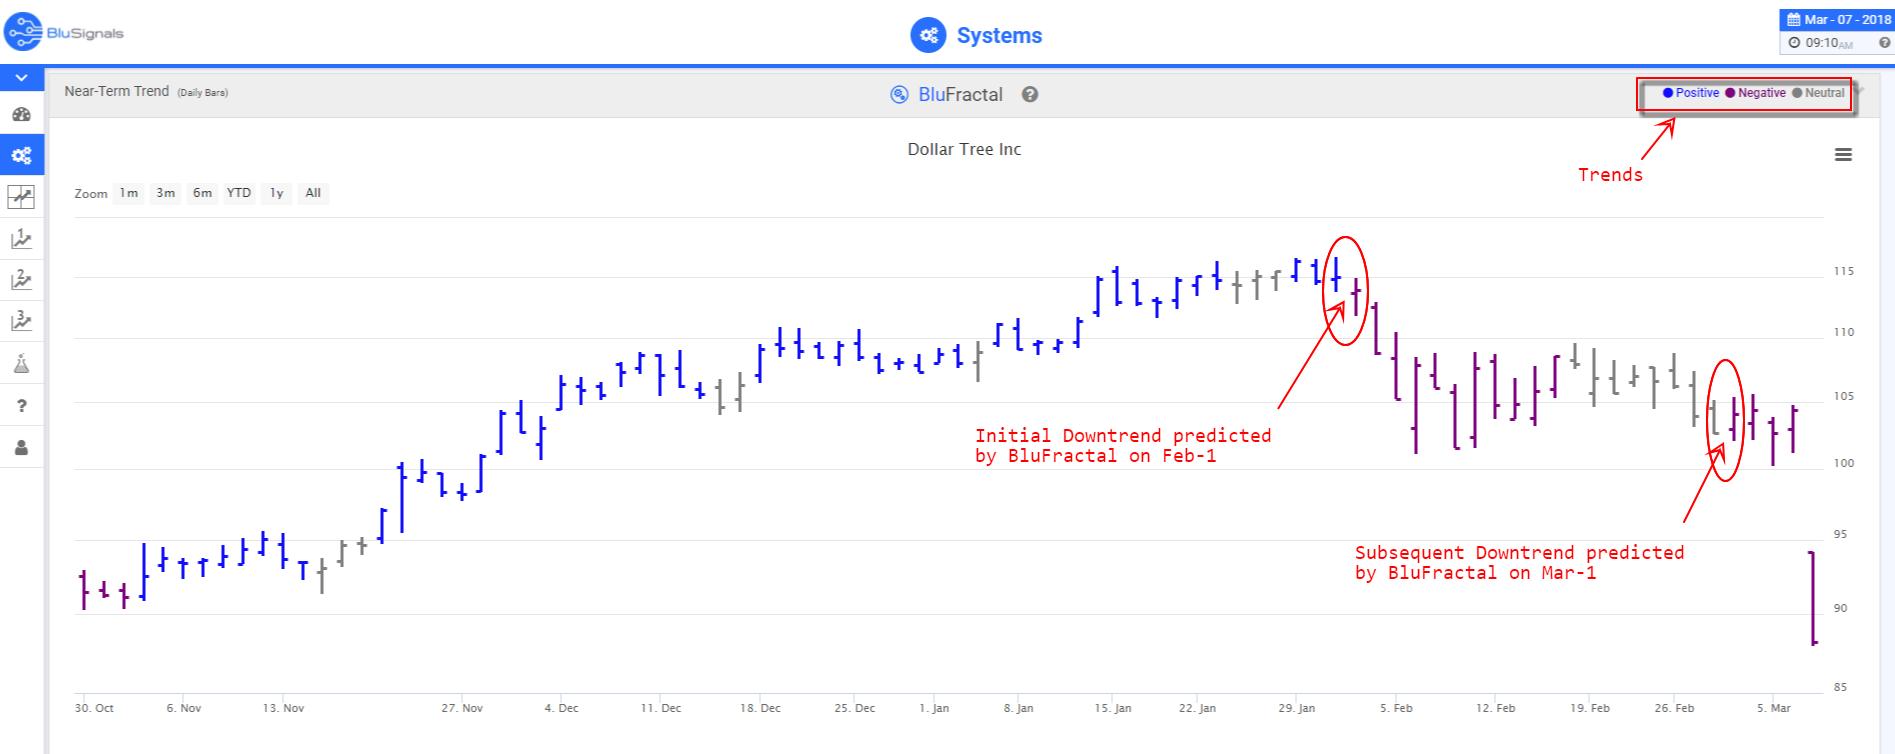 DLTR trading signals